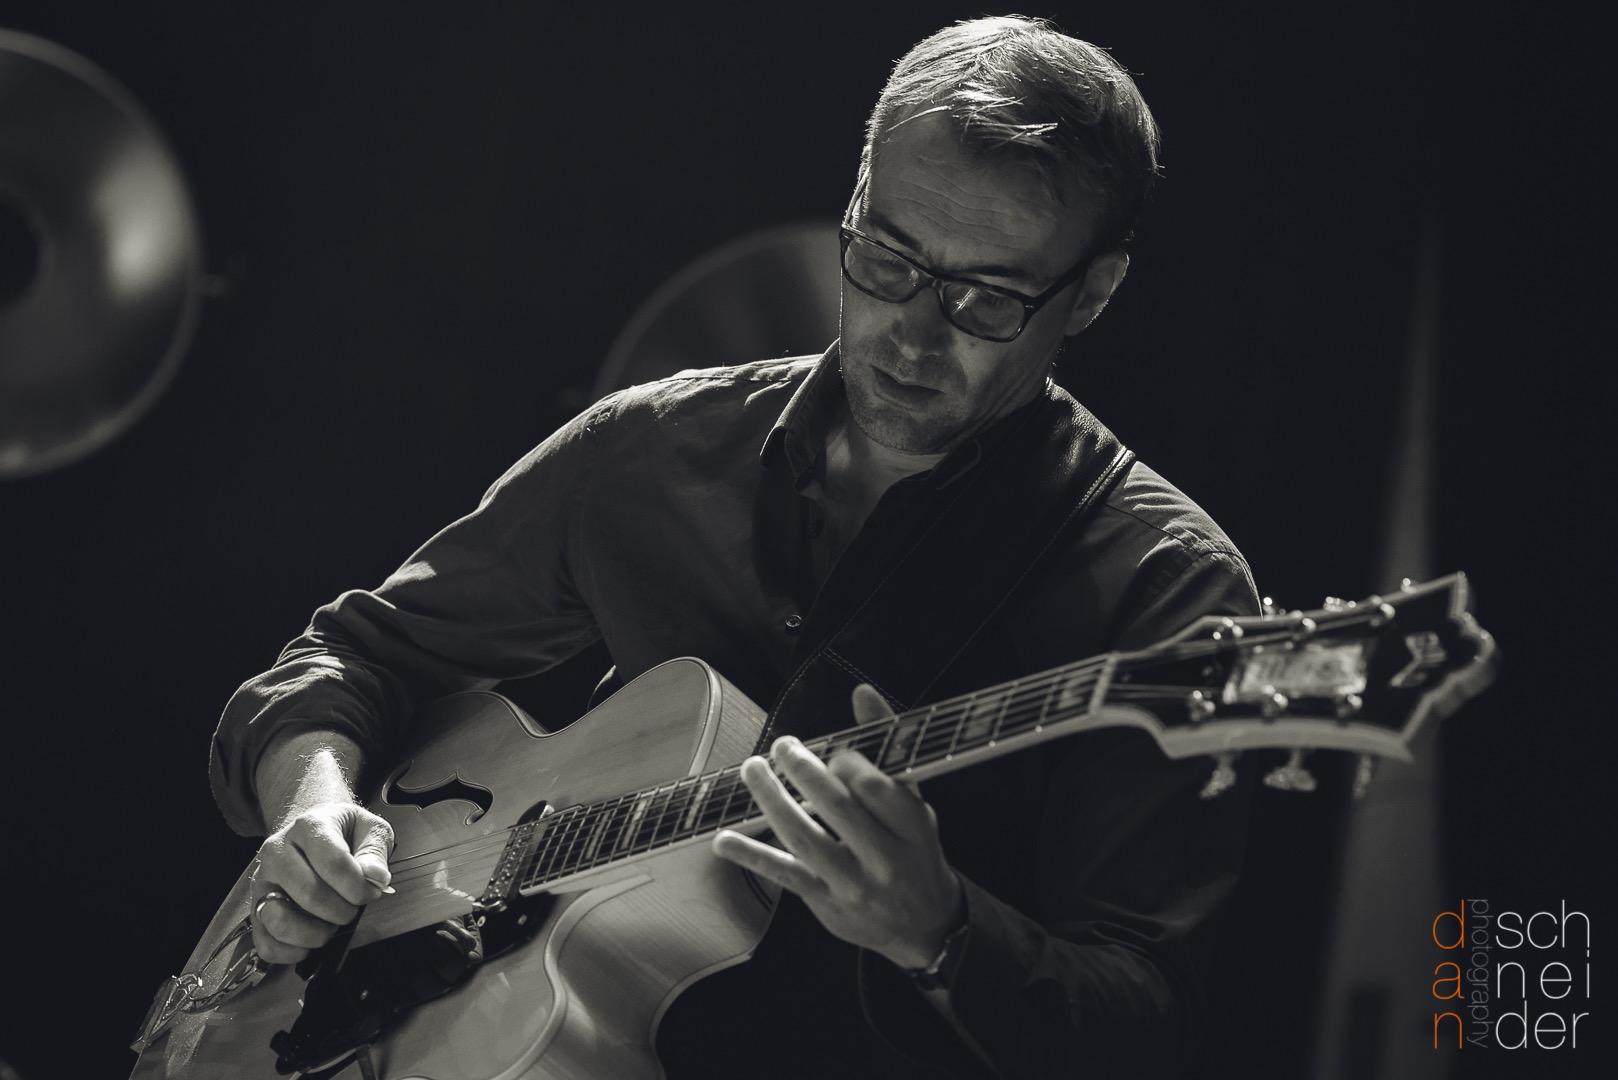 gitarren unterricht köln